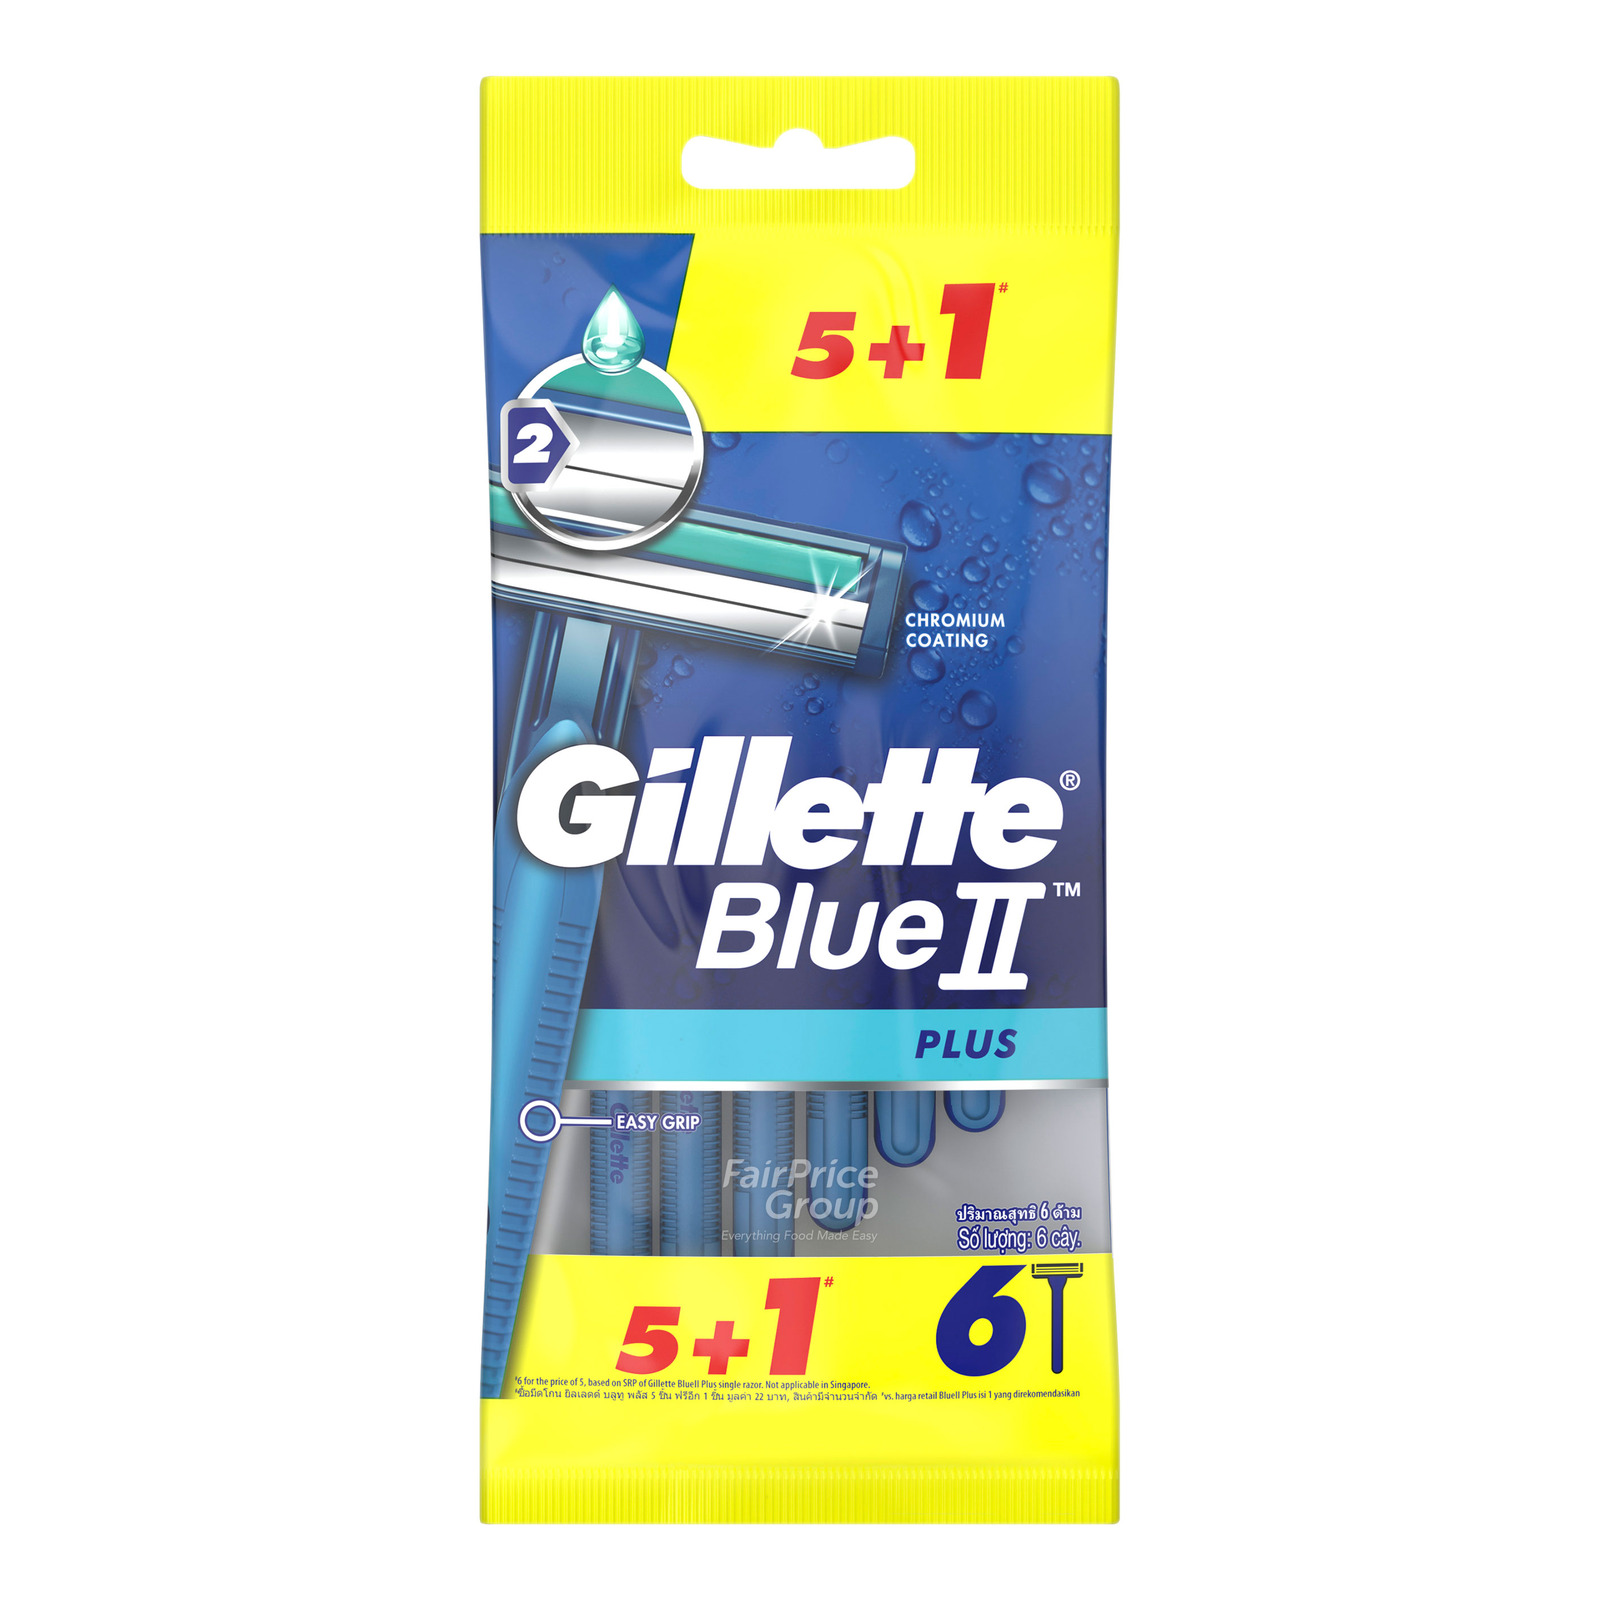 Gillette Disposable Razor - Blue II Plus